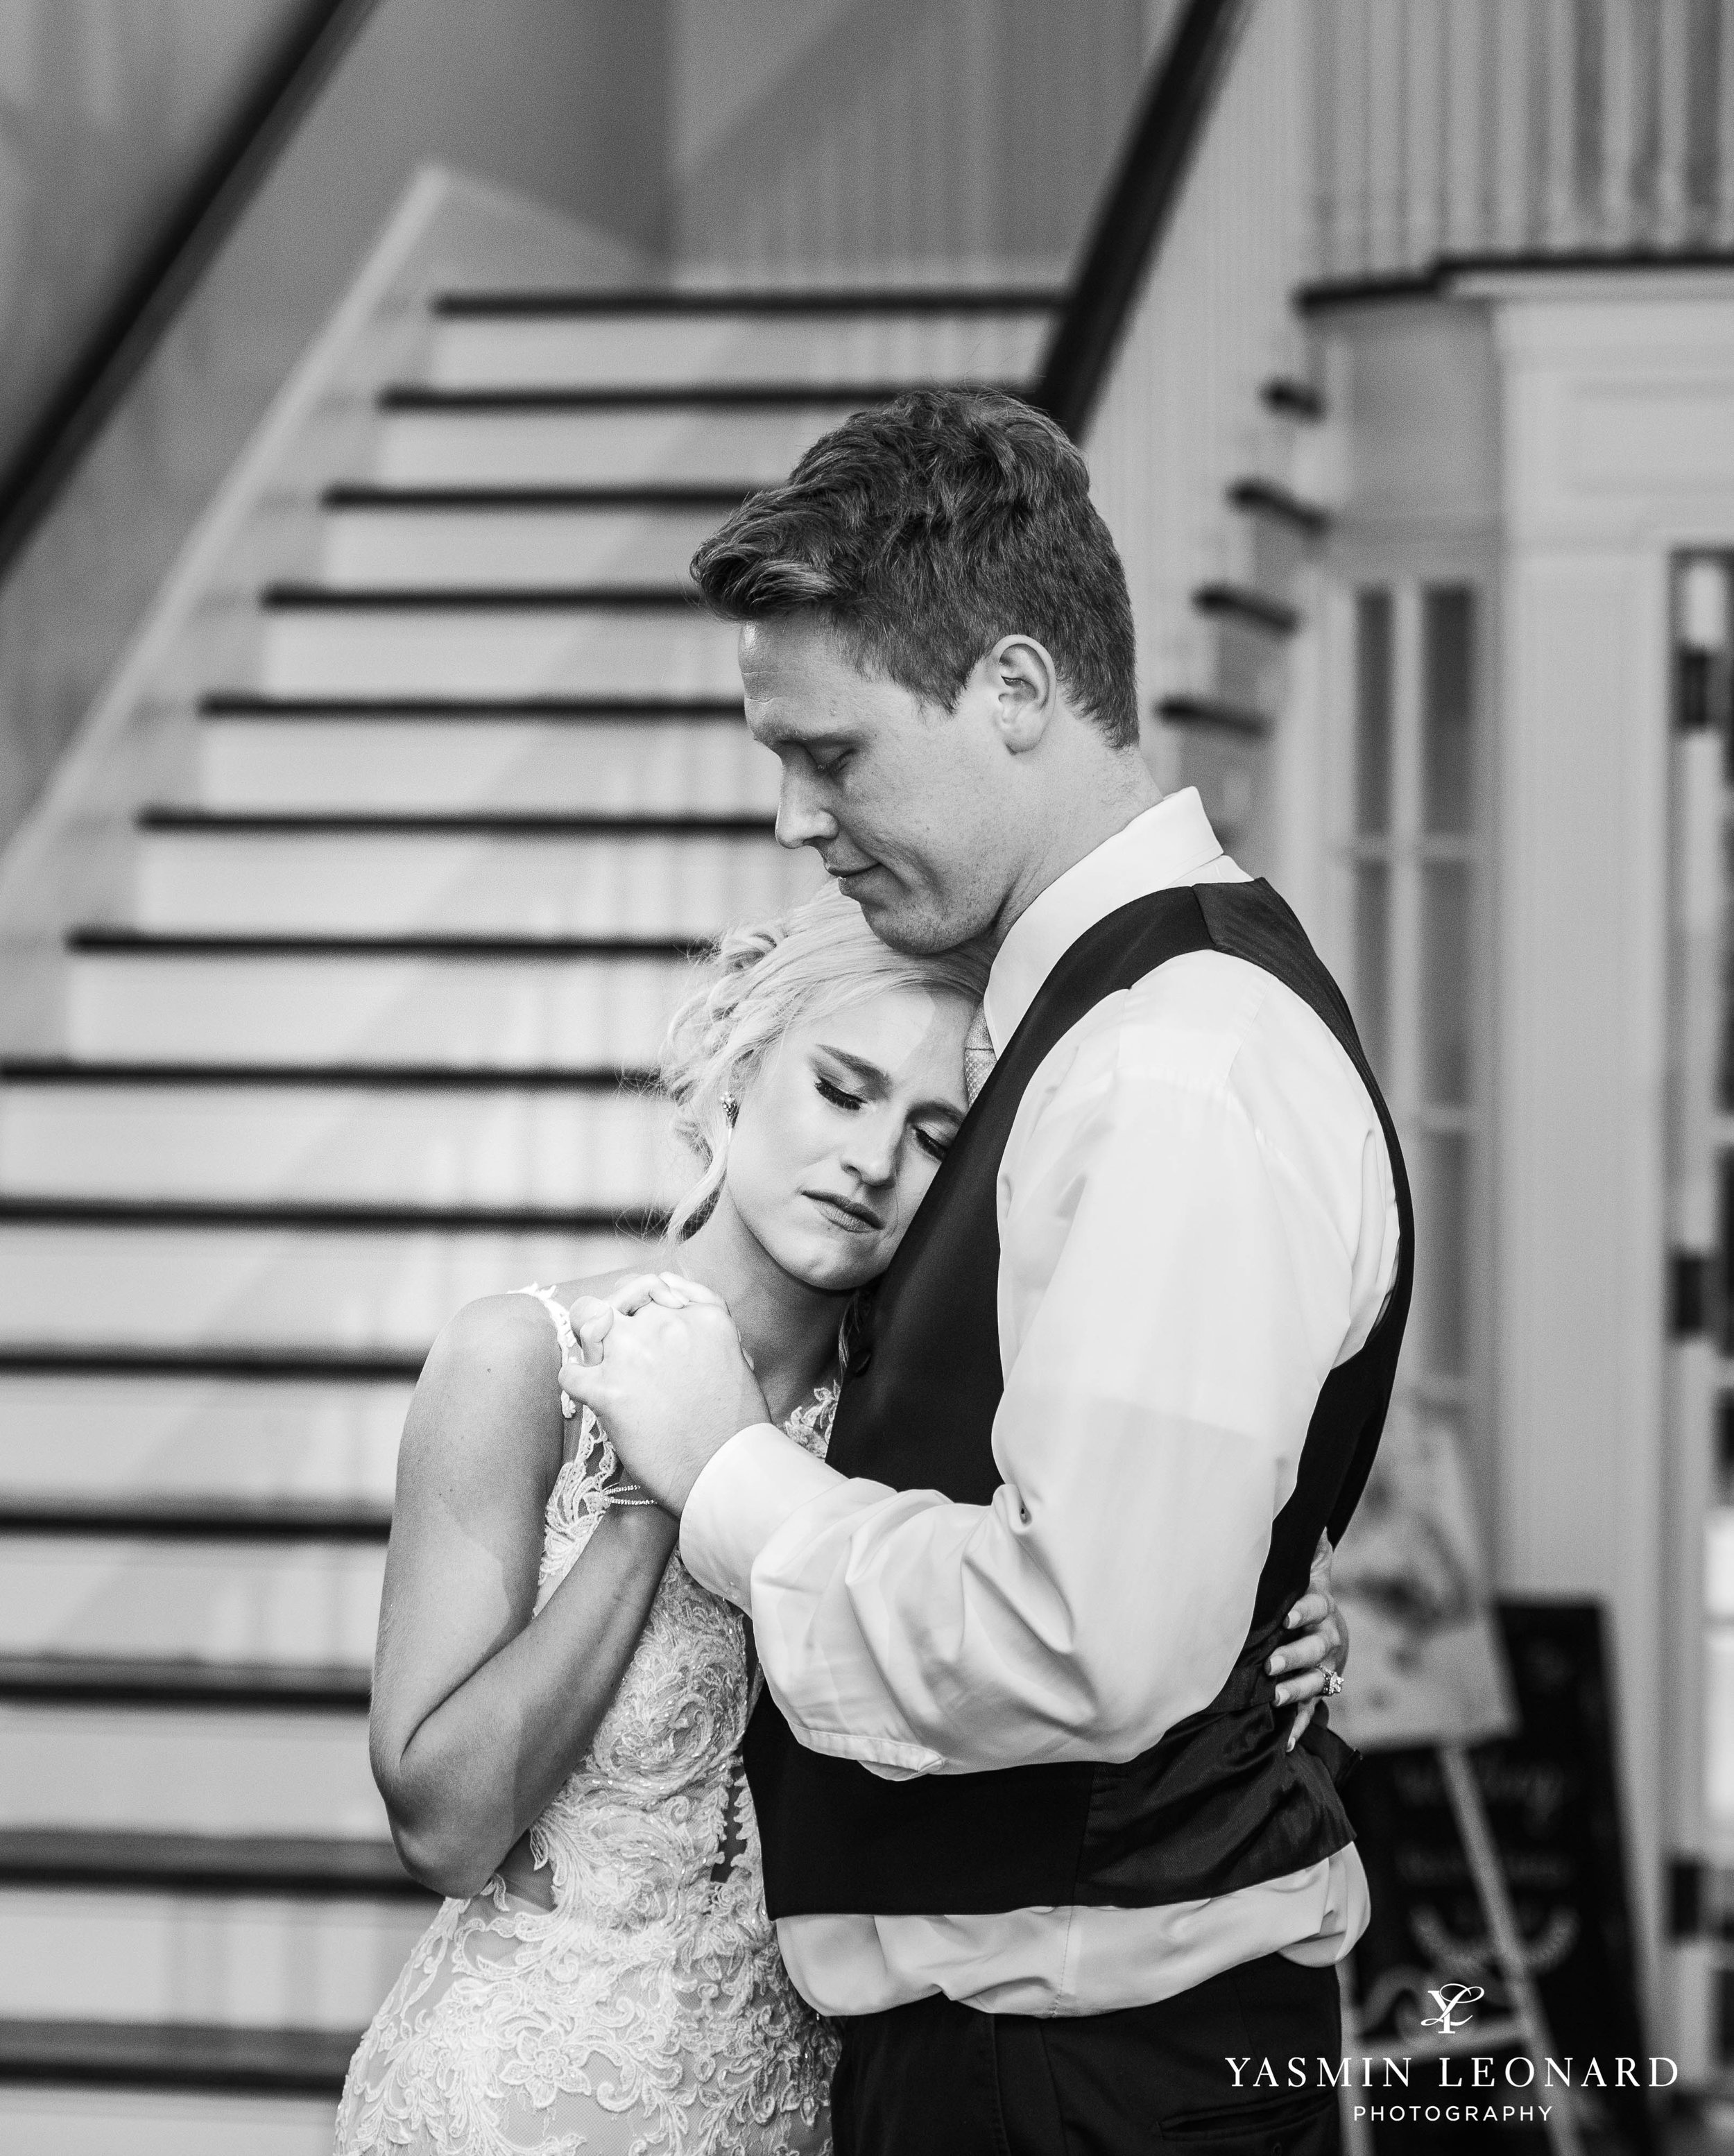 Separk Mansion - NC Weddings - Gastonia Wedding - NC Wedding Venues - Pink and Blue Wedding Ideas - Pink Bridesmaid Dresses - Yasmin Leonard Photography-53.jpg